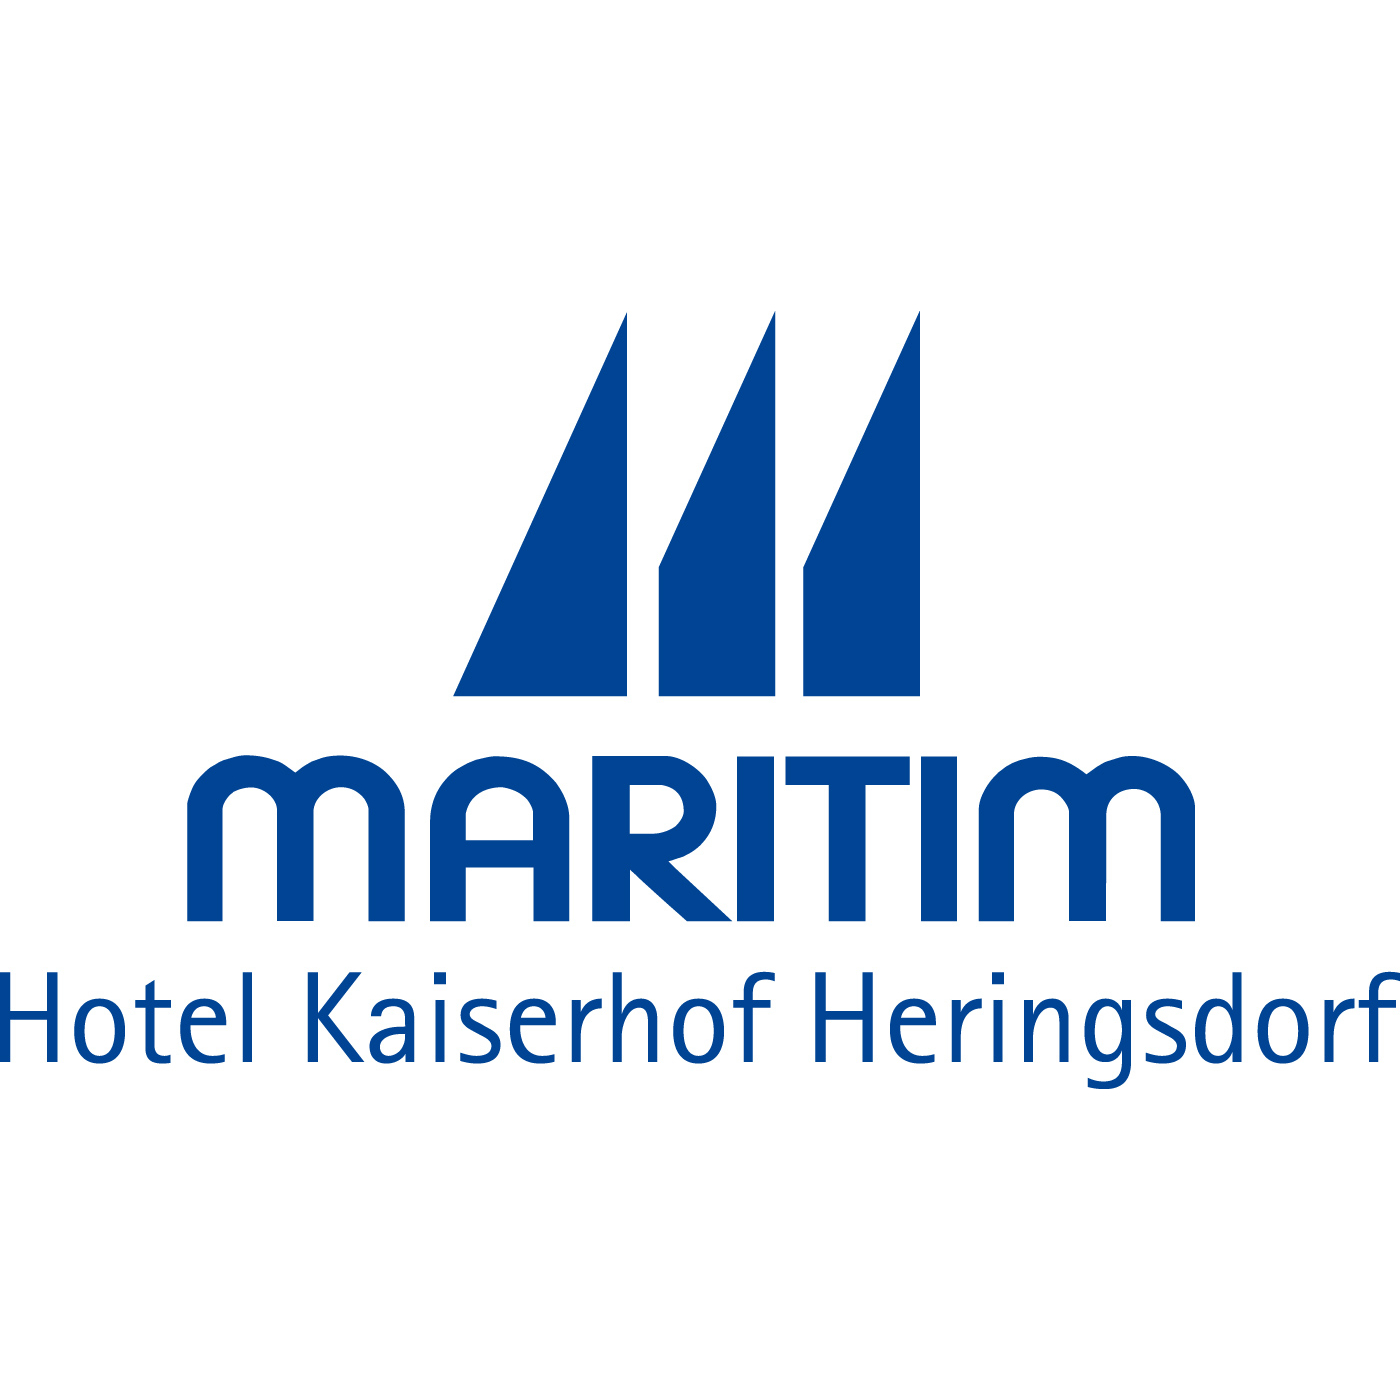 Bild zu Maritim Hotel Kaiserhof Heringsdorf in Heringsdorf Seebad